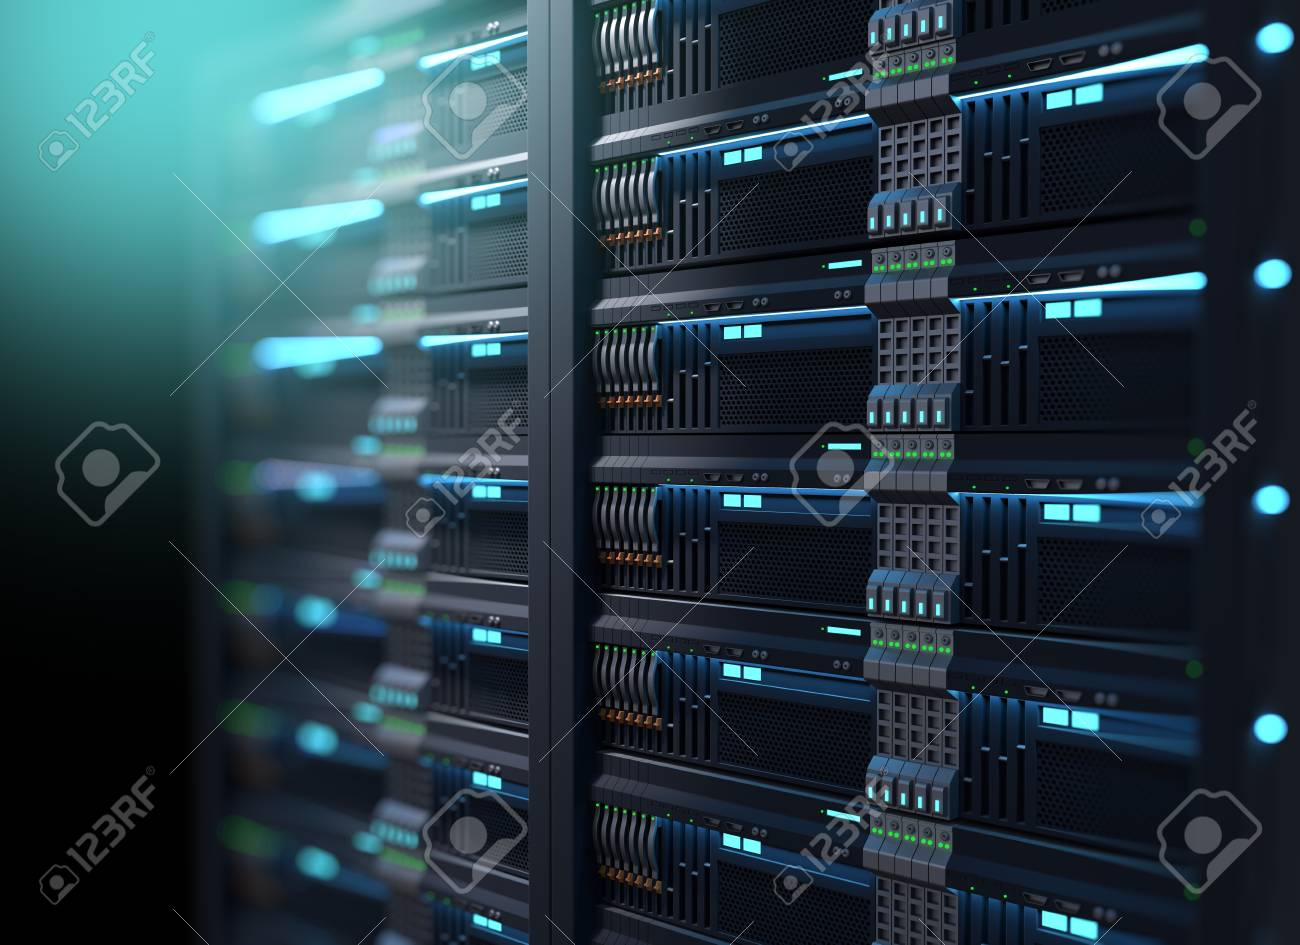 3D illustration of super computer server racks in datacenter,concept of big data storage and mining cryptocurrency. - 95713067